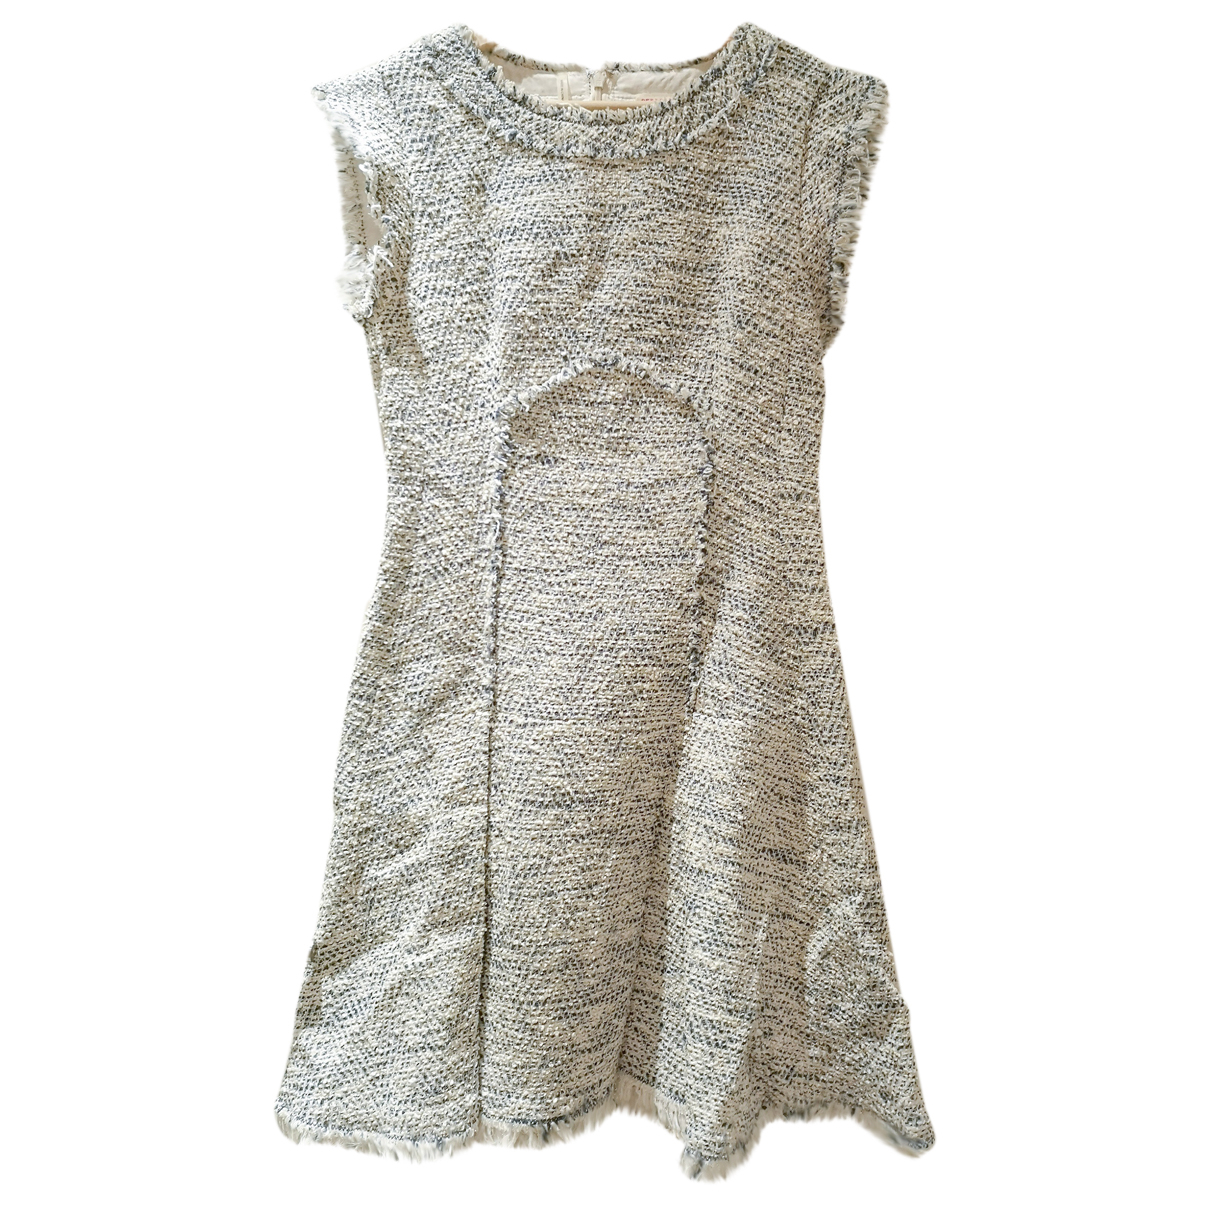 Rebecca Taylor N Cotton dress for Women 4 US